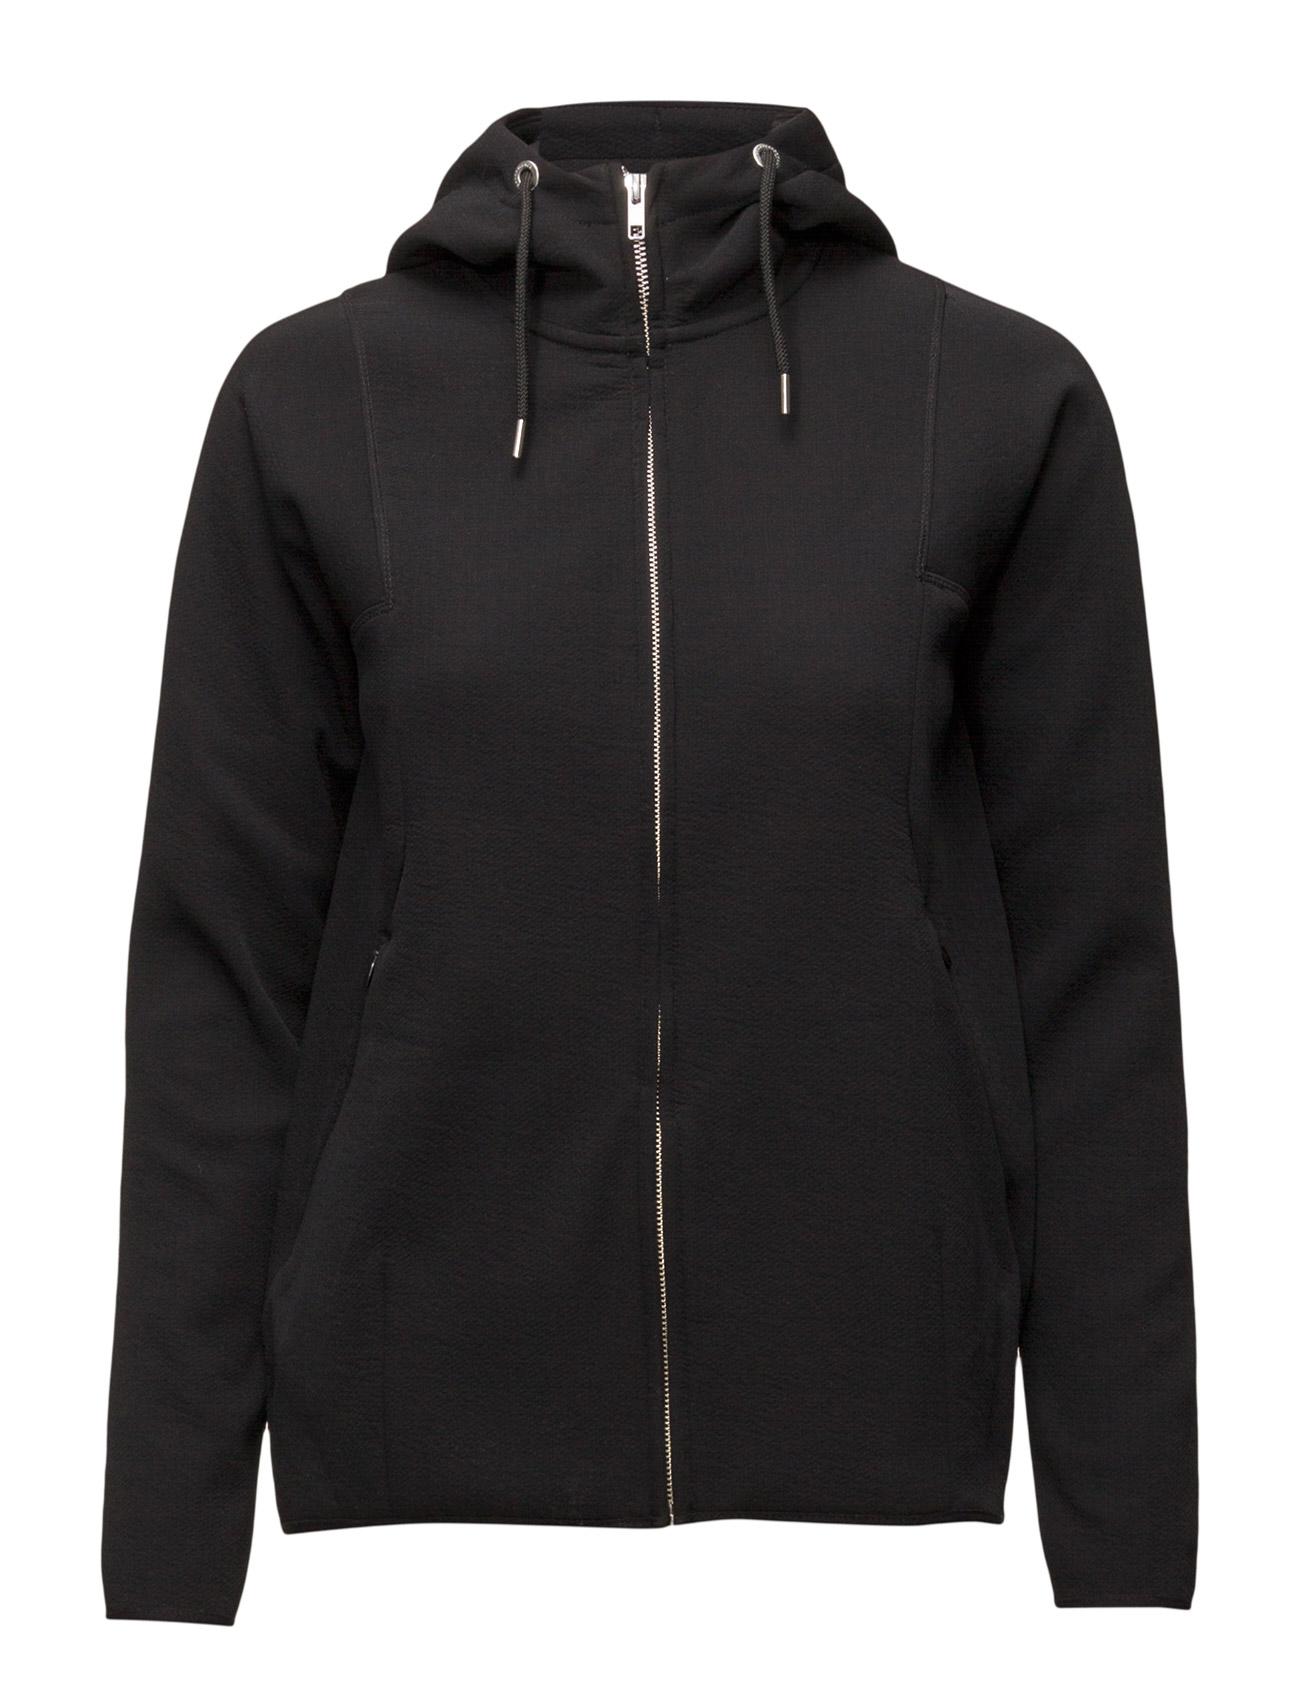 Sense Zip Peak Performance Sweatshirts til Damer i Sort